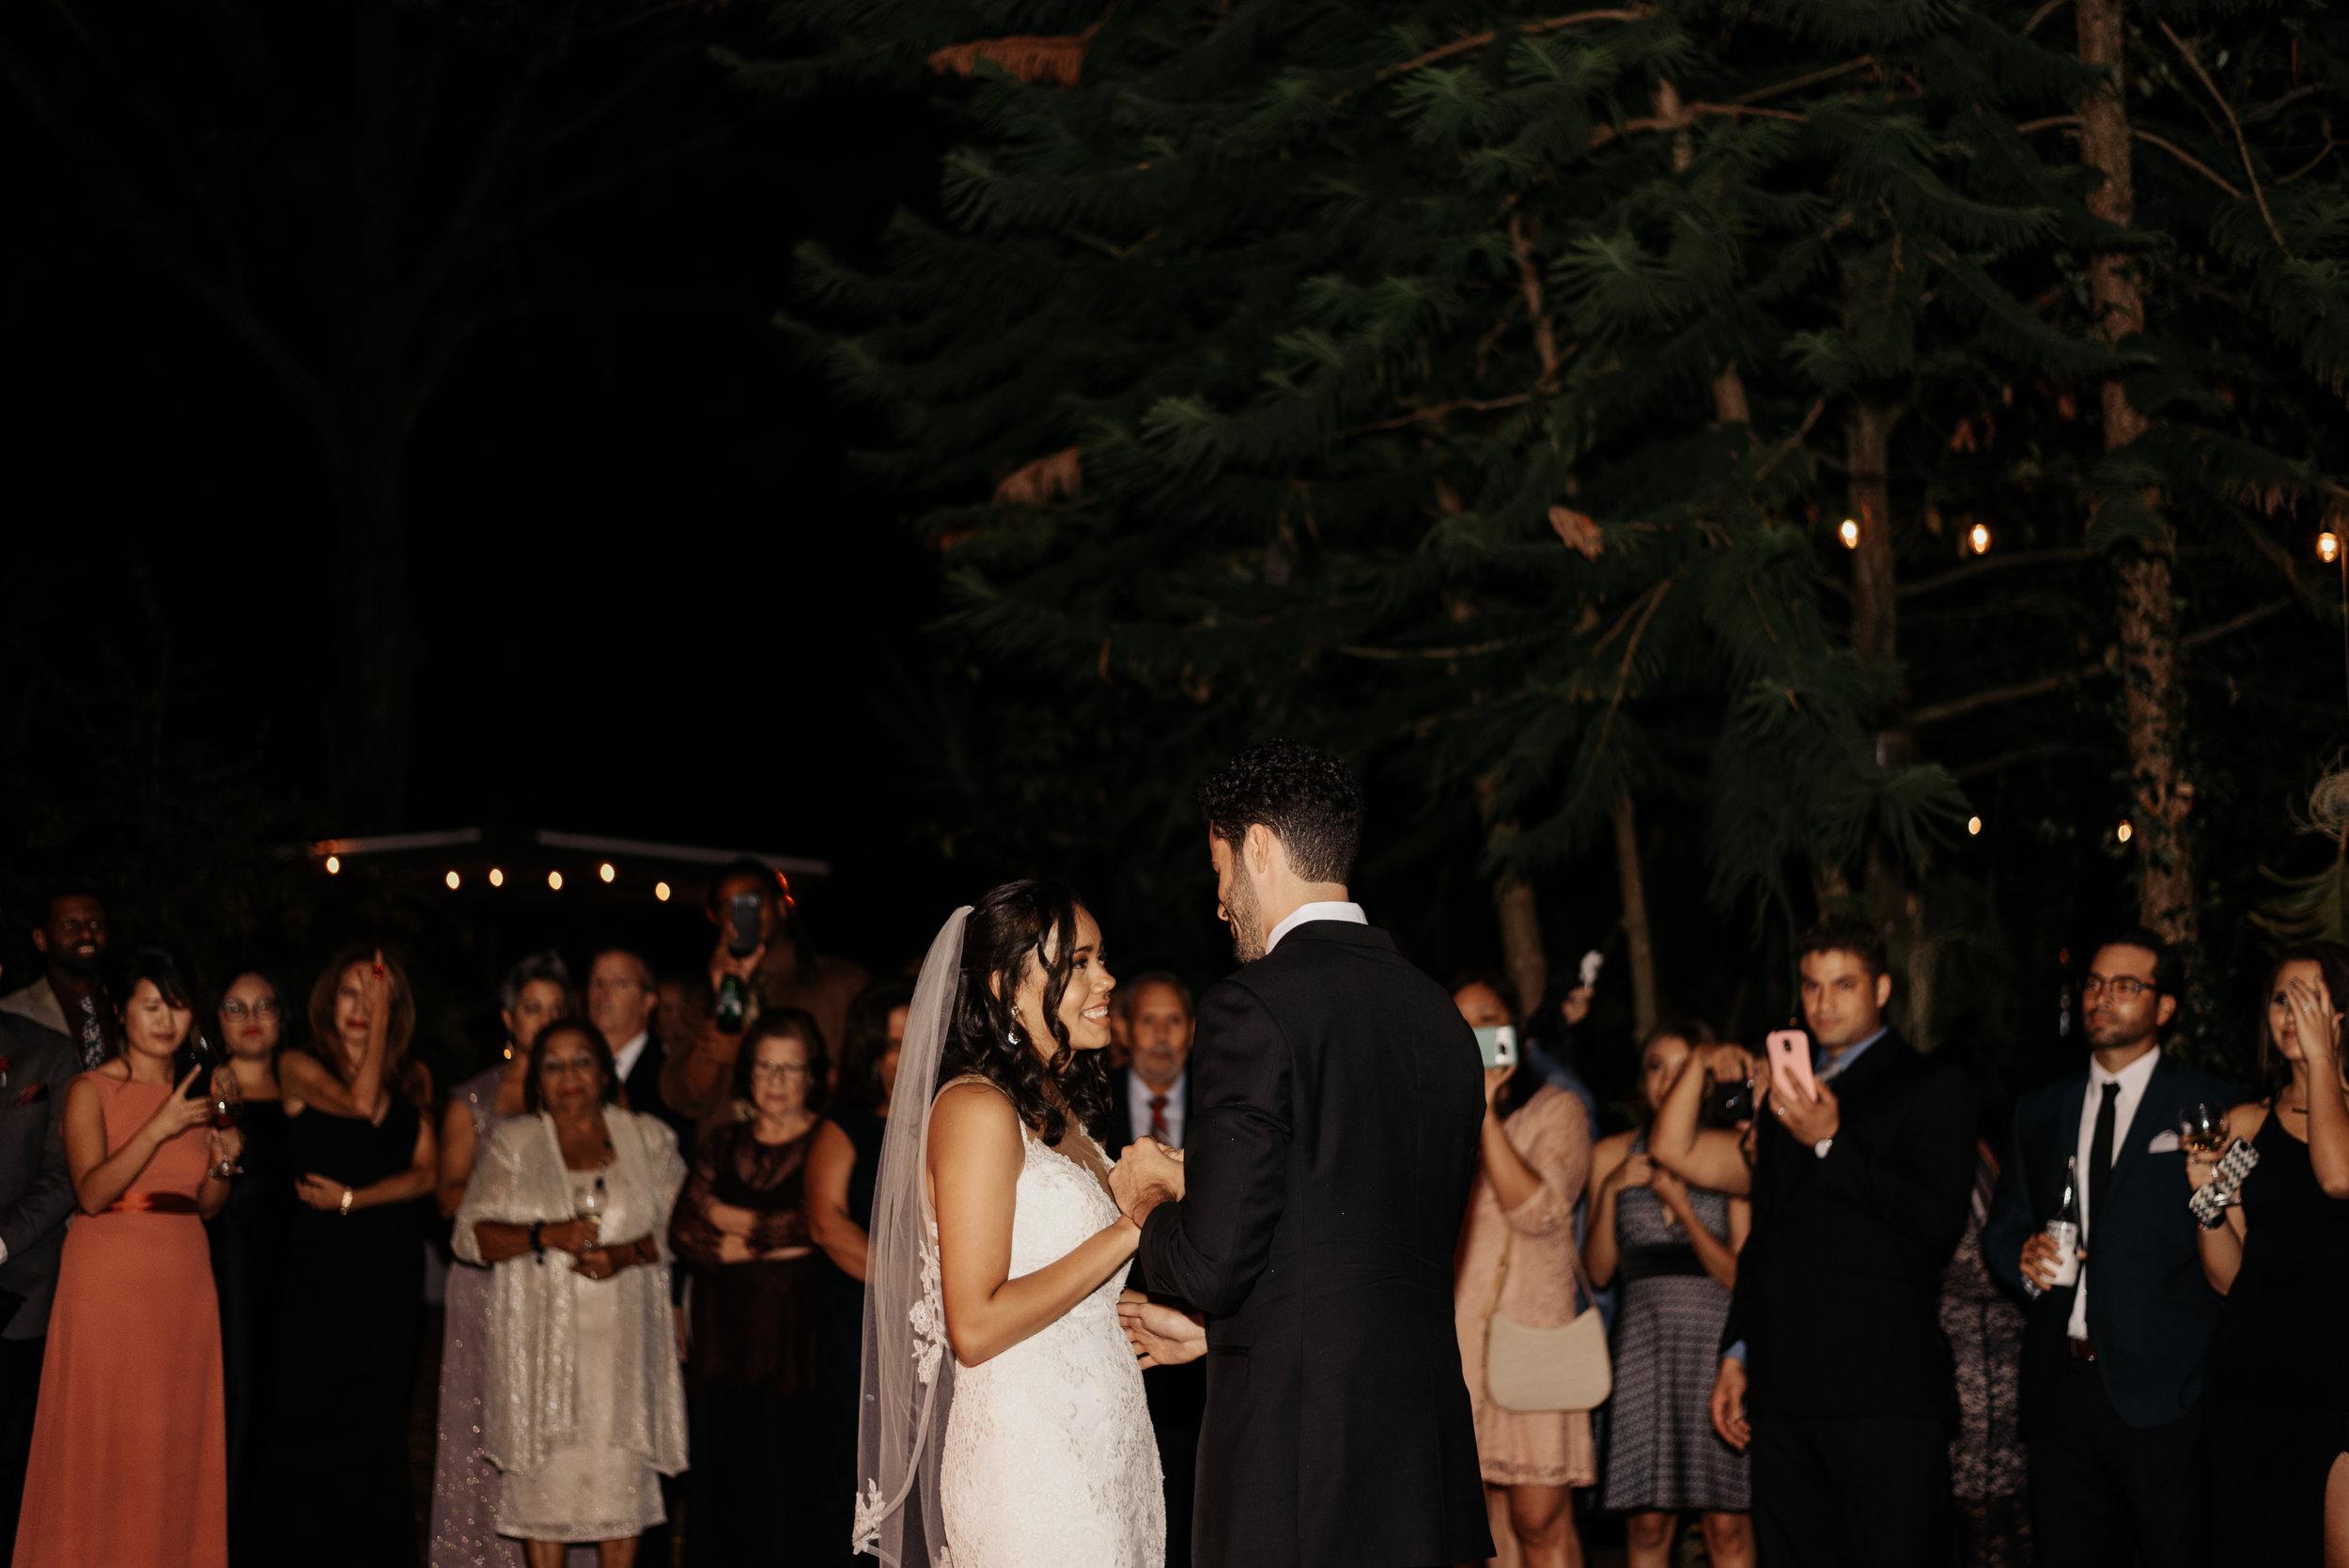 Kirstie-AJ-Wedding-9198.jpg